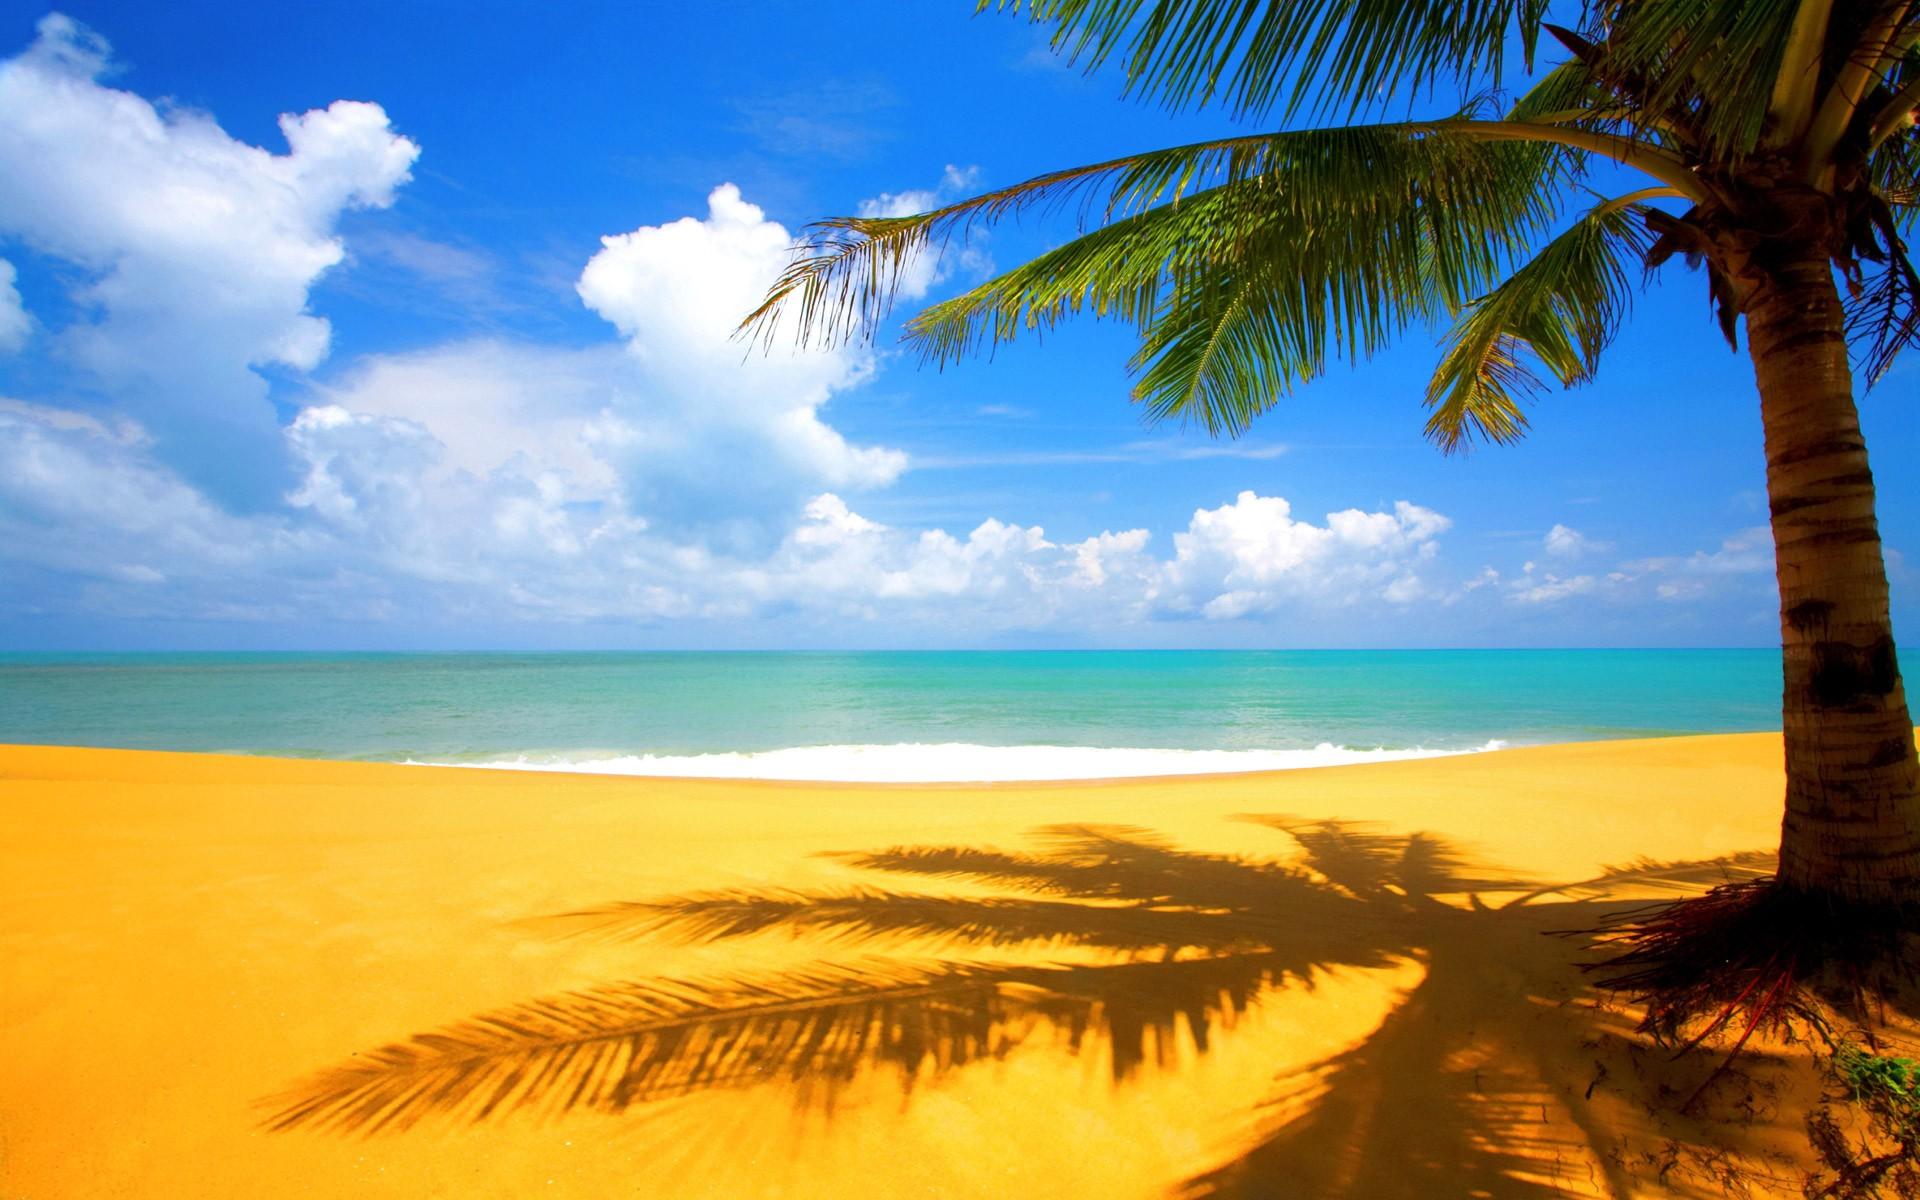 Hd wallpaper widescreen 1080p nature - Hd Beach Wallpaper Wallpapersafari